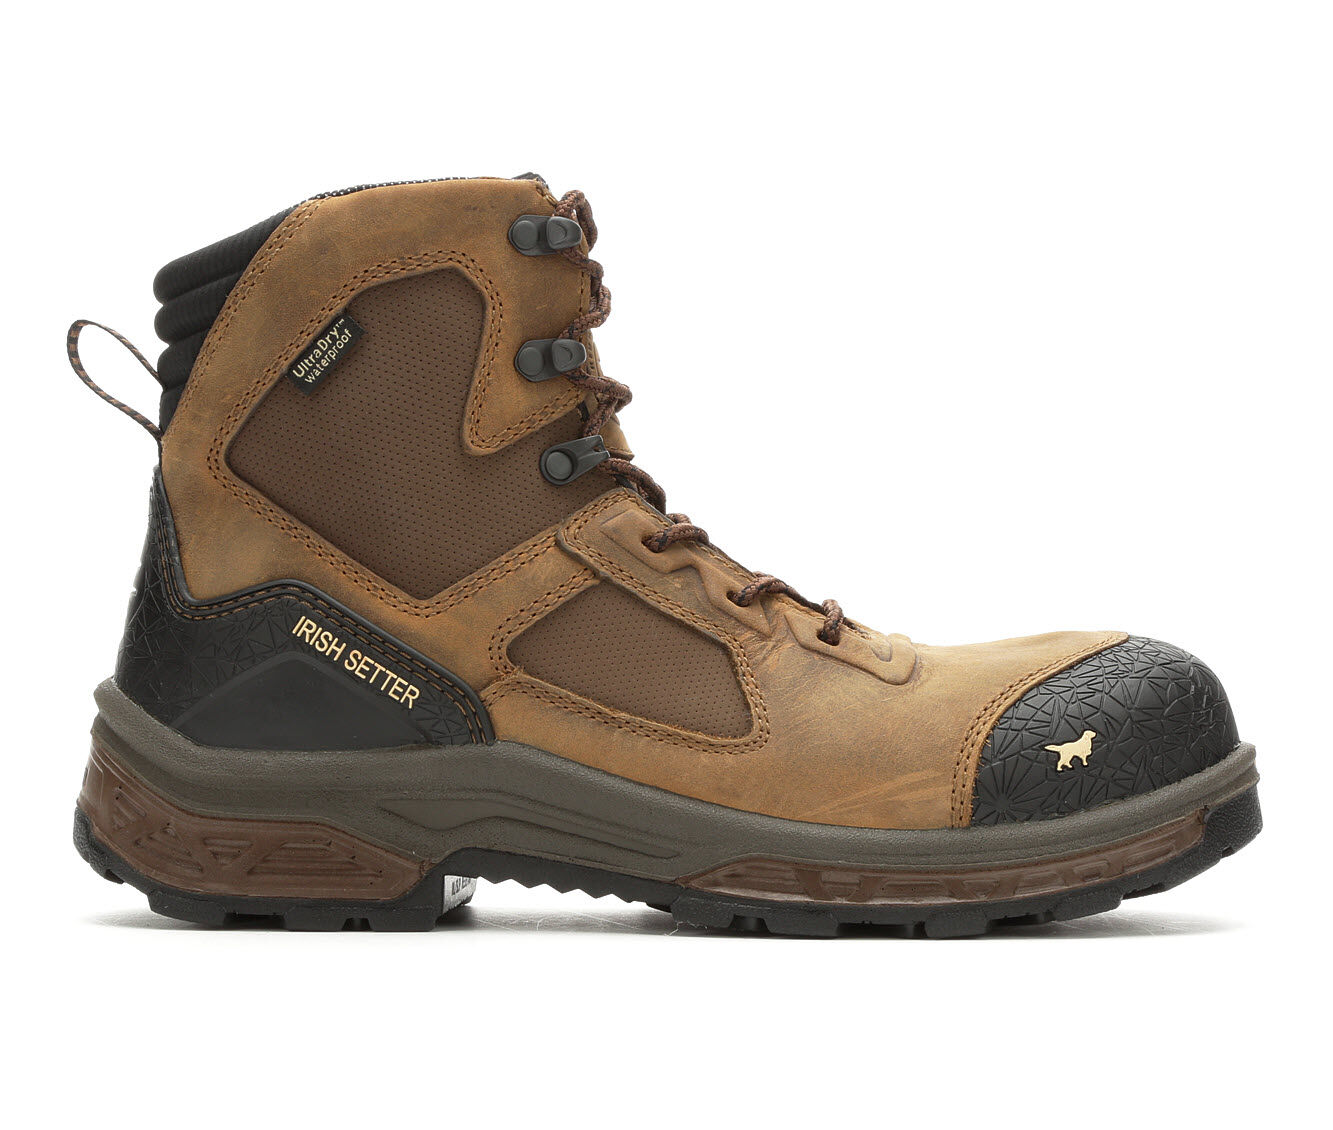 uk shoes_kd1254